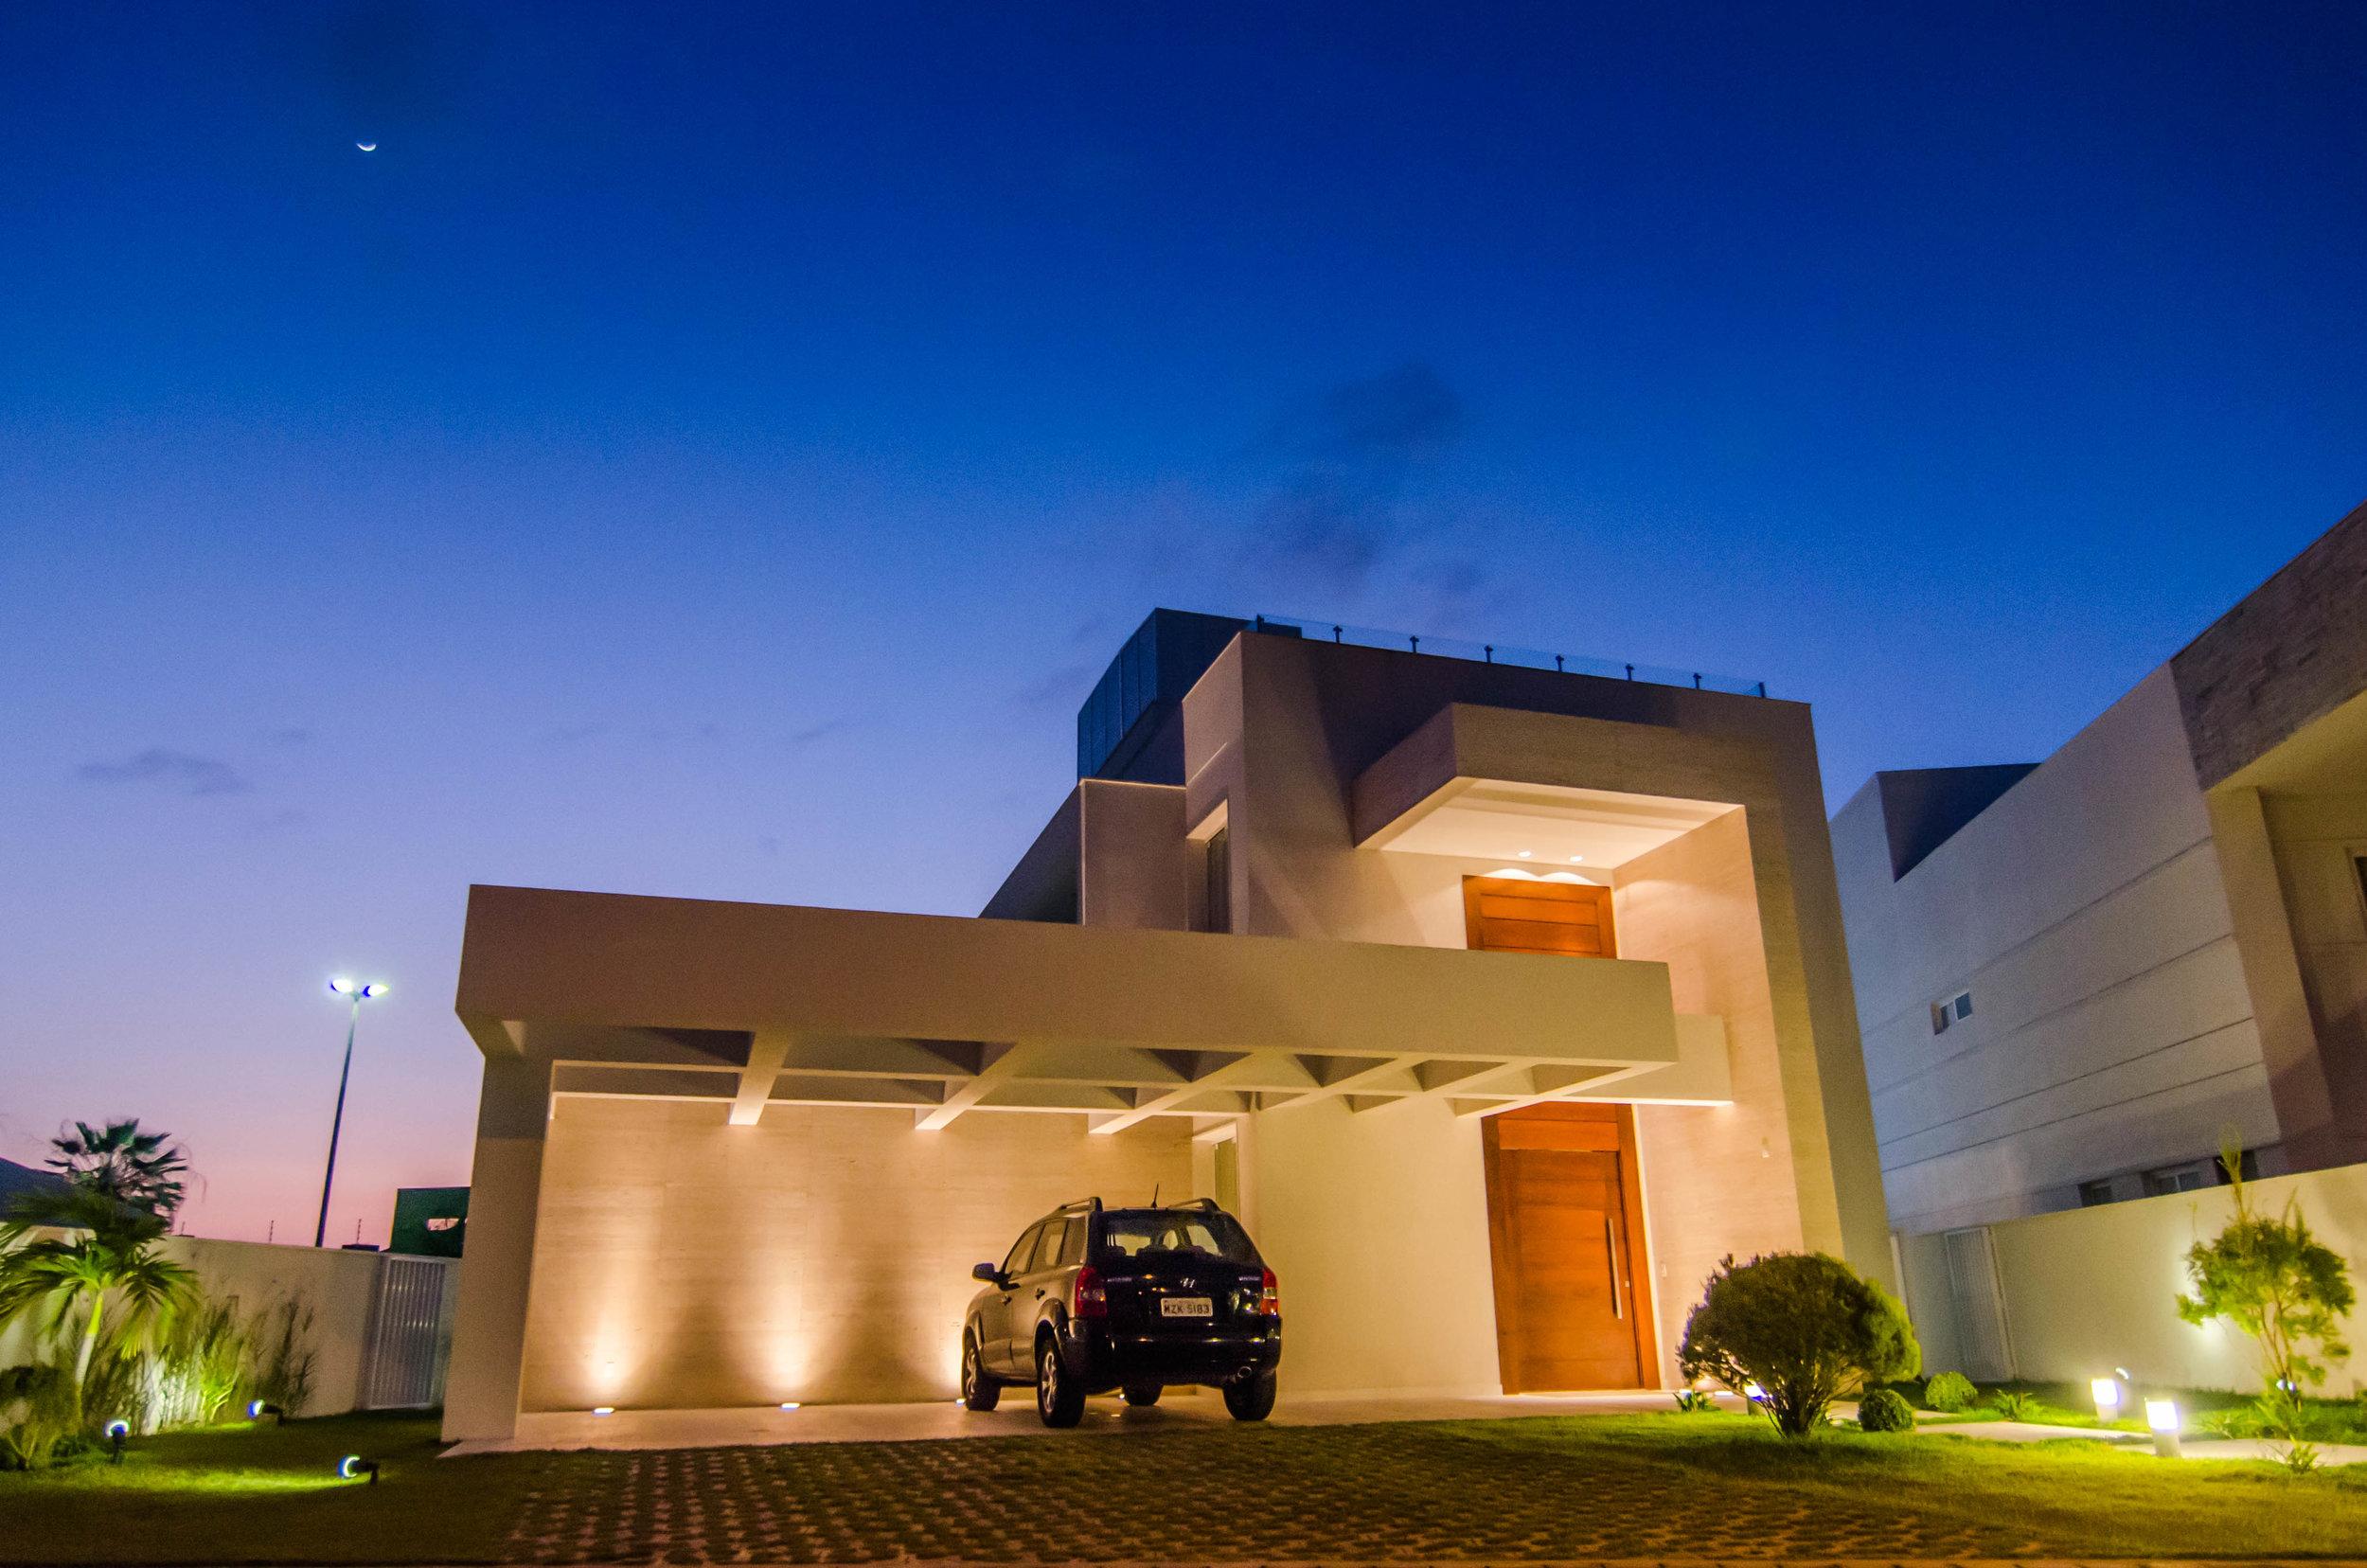 projeto-arquitetonico-edenio-duo-arquitetura-casa-014.jpg